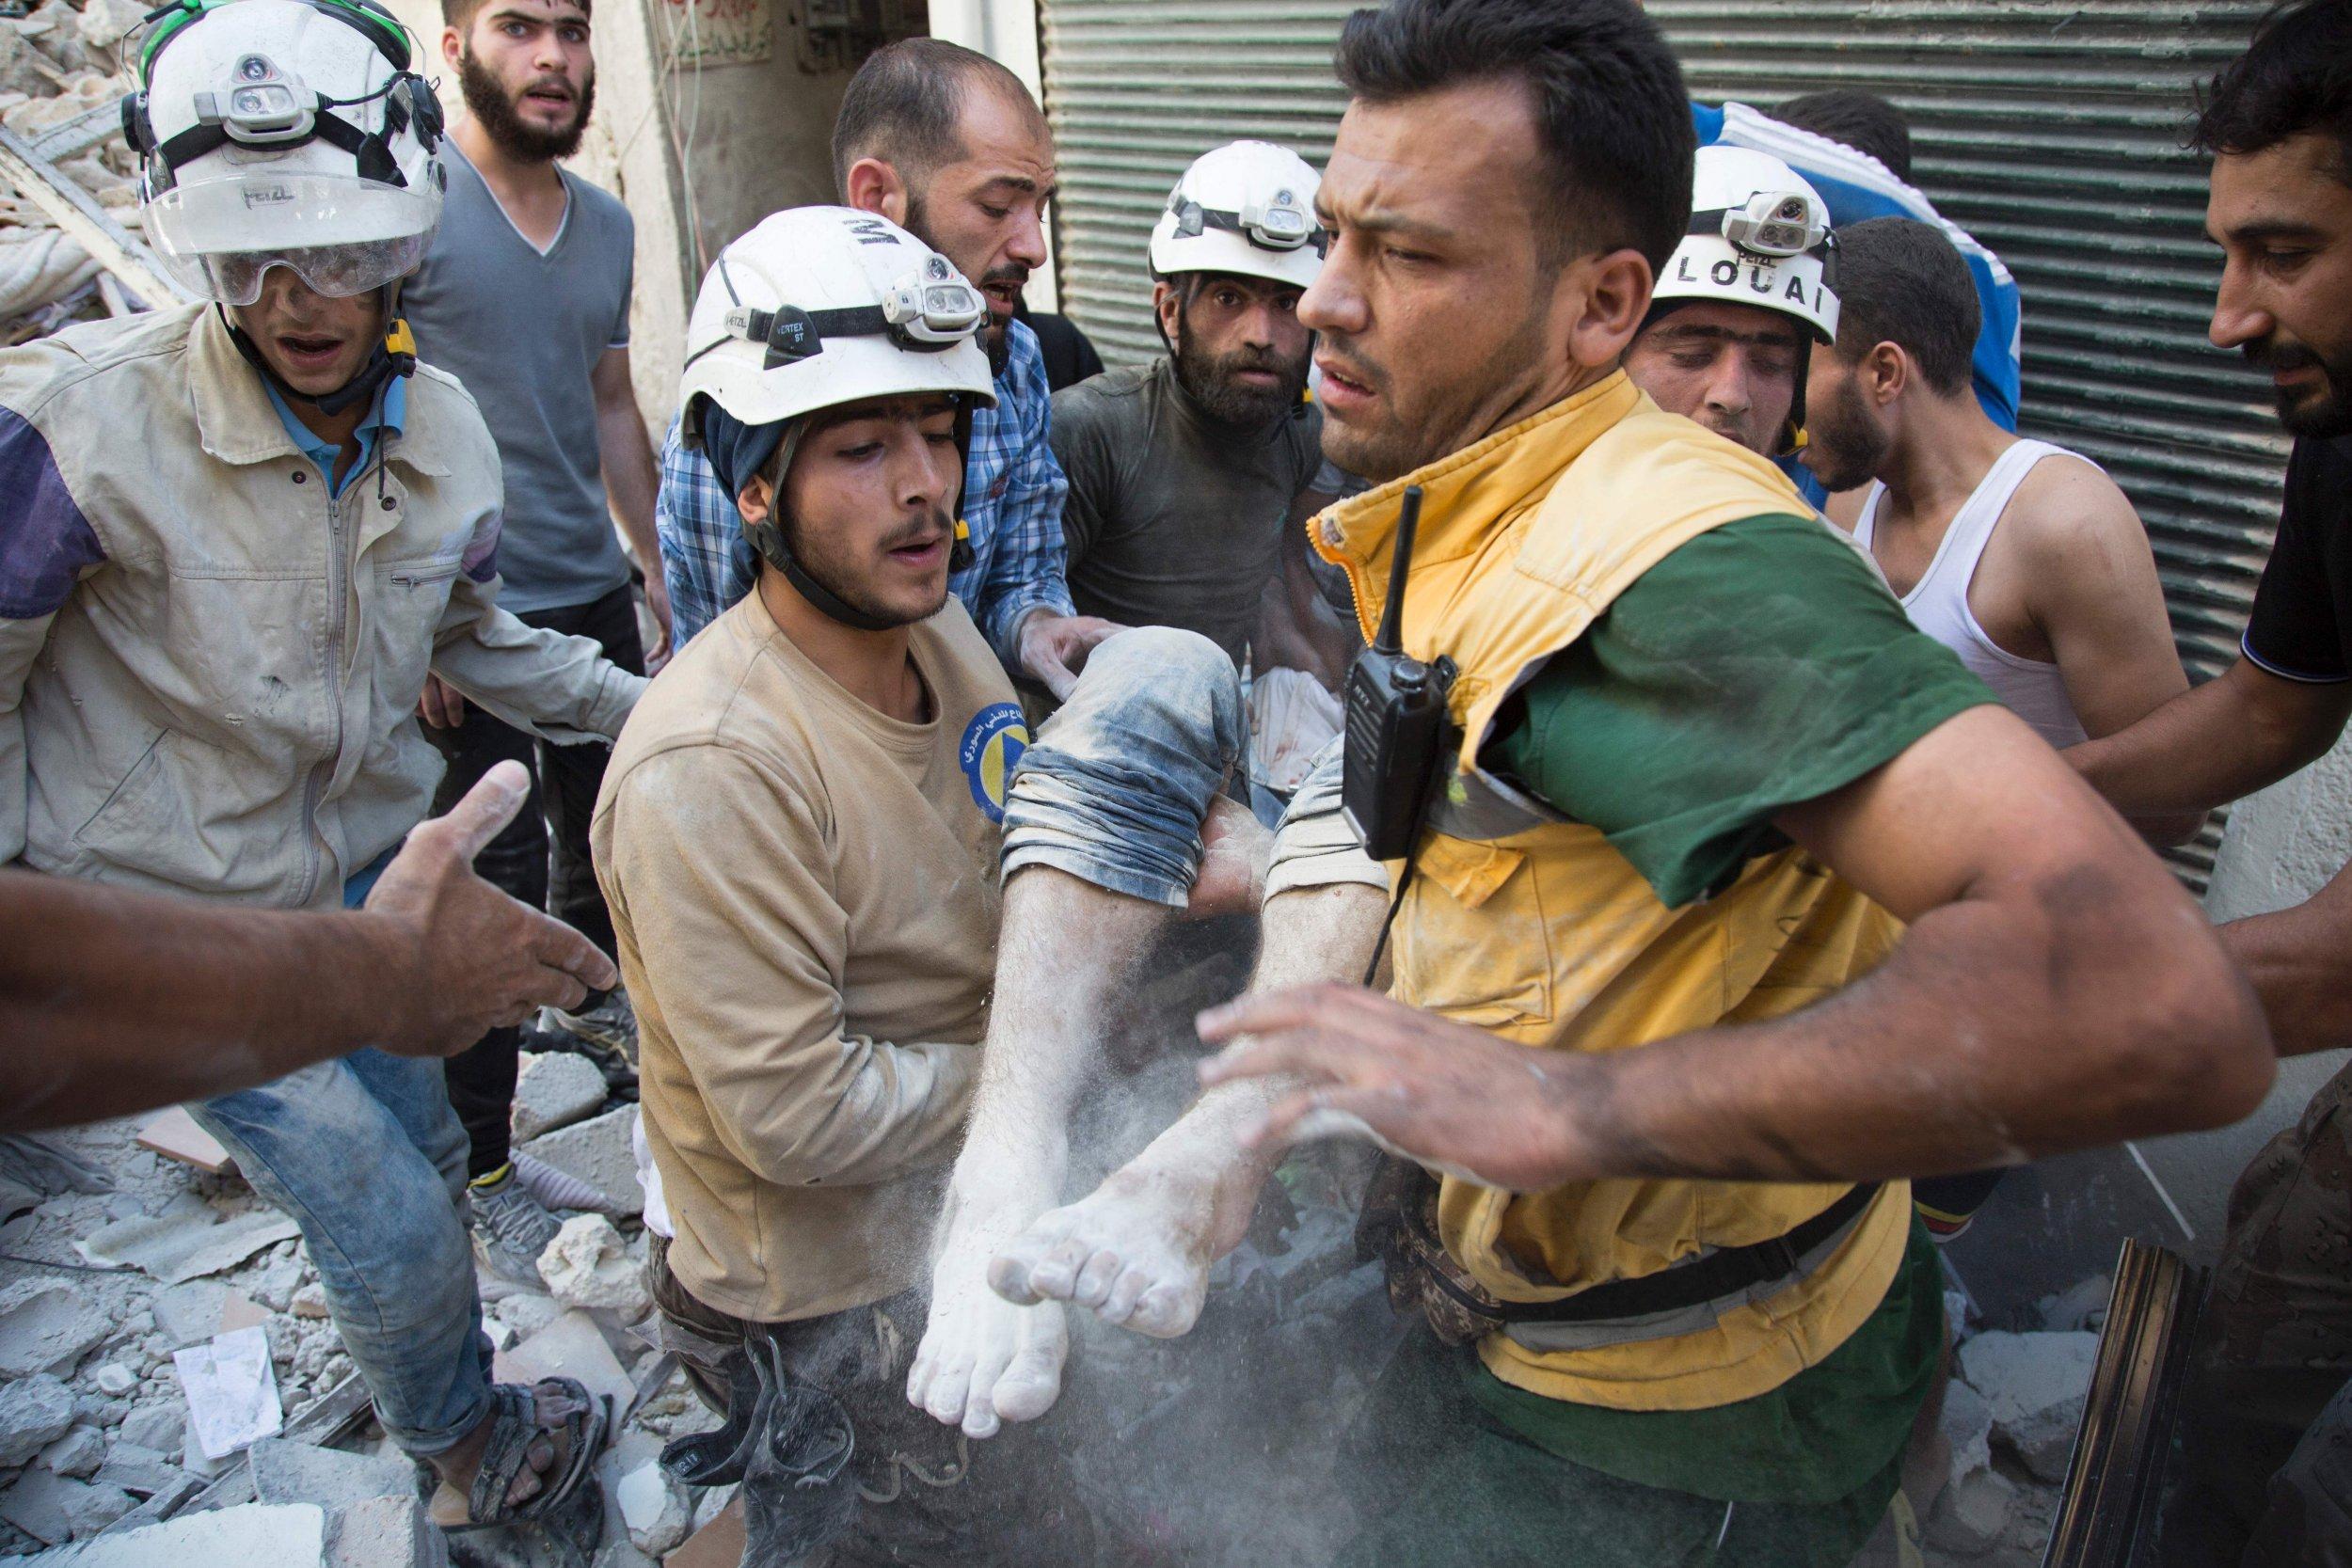 https://i2.wp.com/s.newsweek.com/sites/www.newsweek.com/files/2016/09/08/white-helmets-rescue-body-rubble-aleppo.jpg